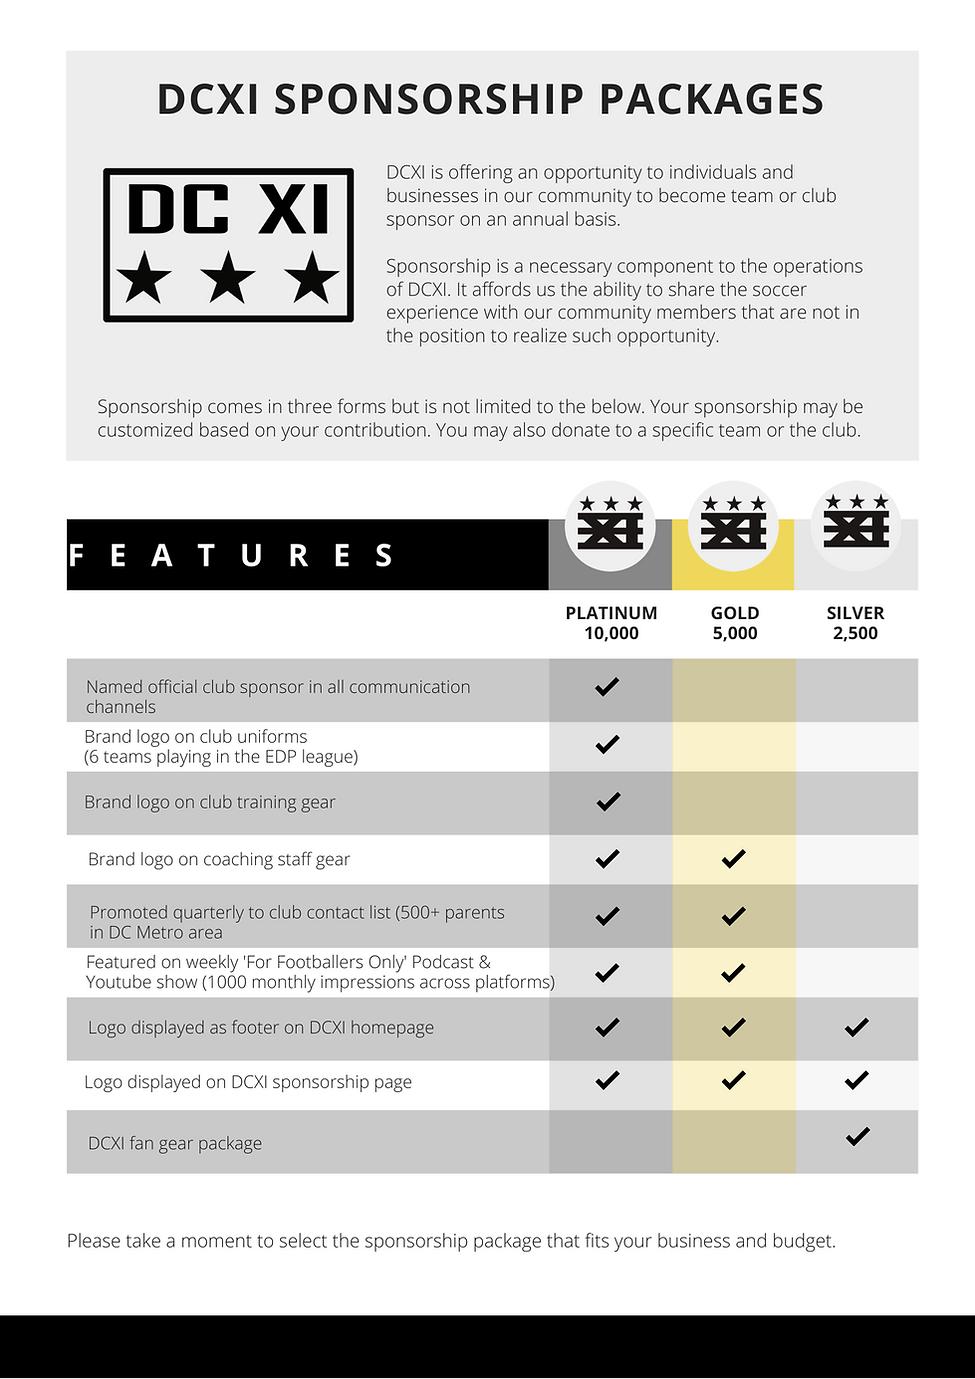 DCXI Sponsorship Packages.png